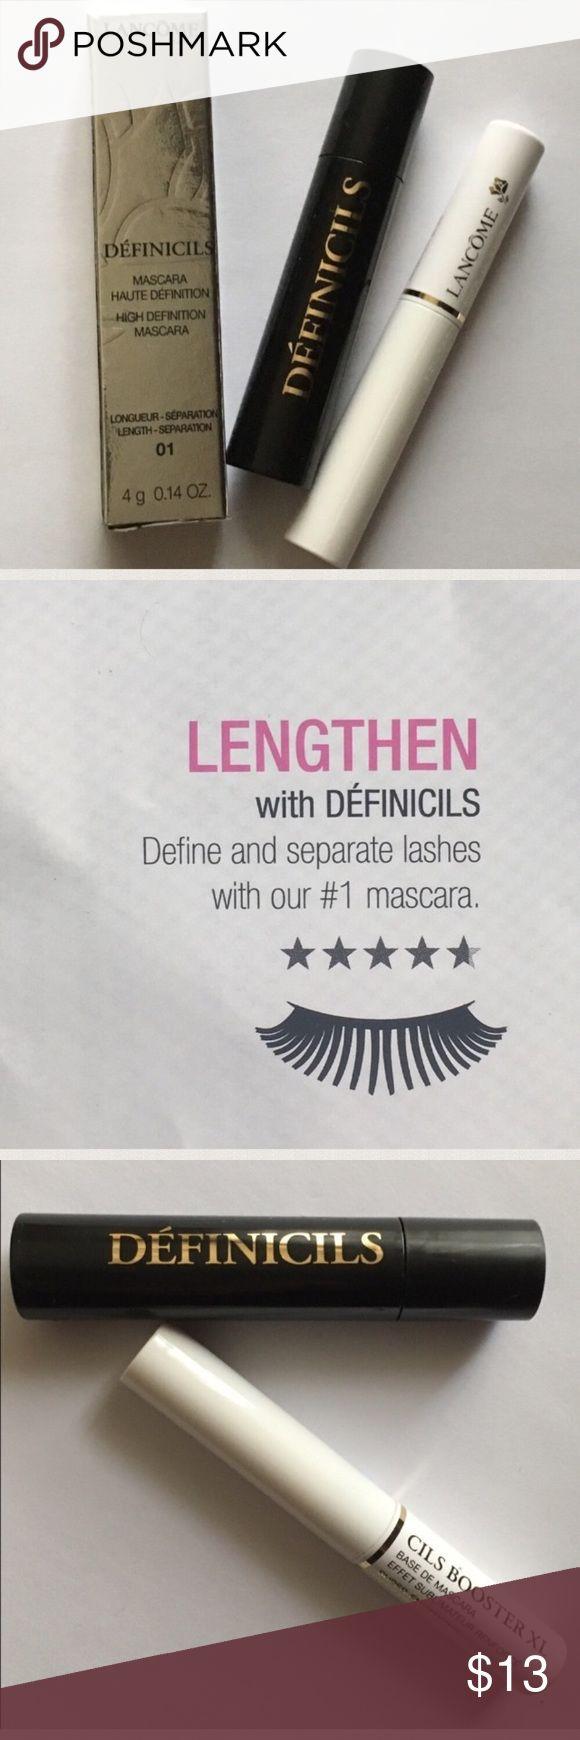 🆕 NEW! Lancôme Definicils Mascara & Cils Base. 🆕 Lancôme Definicils Mascara in Black & Cils Booster X Mascara Base in White. TOTAL VALUE $26.00. BNIB! Lancome Makeup Mascara